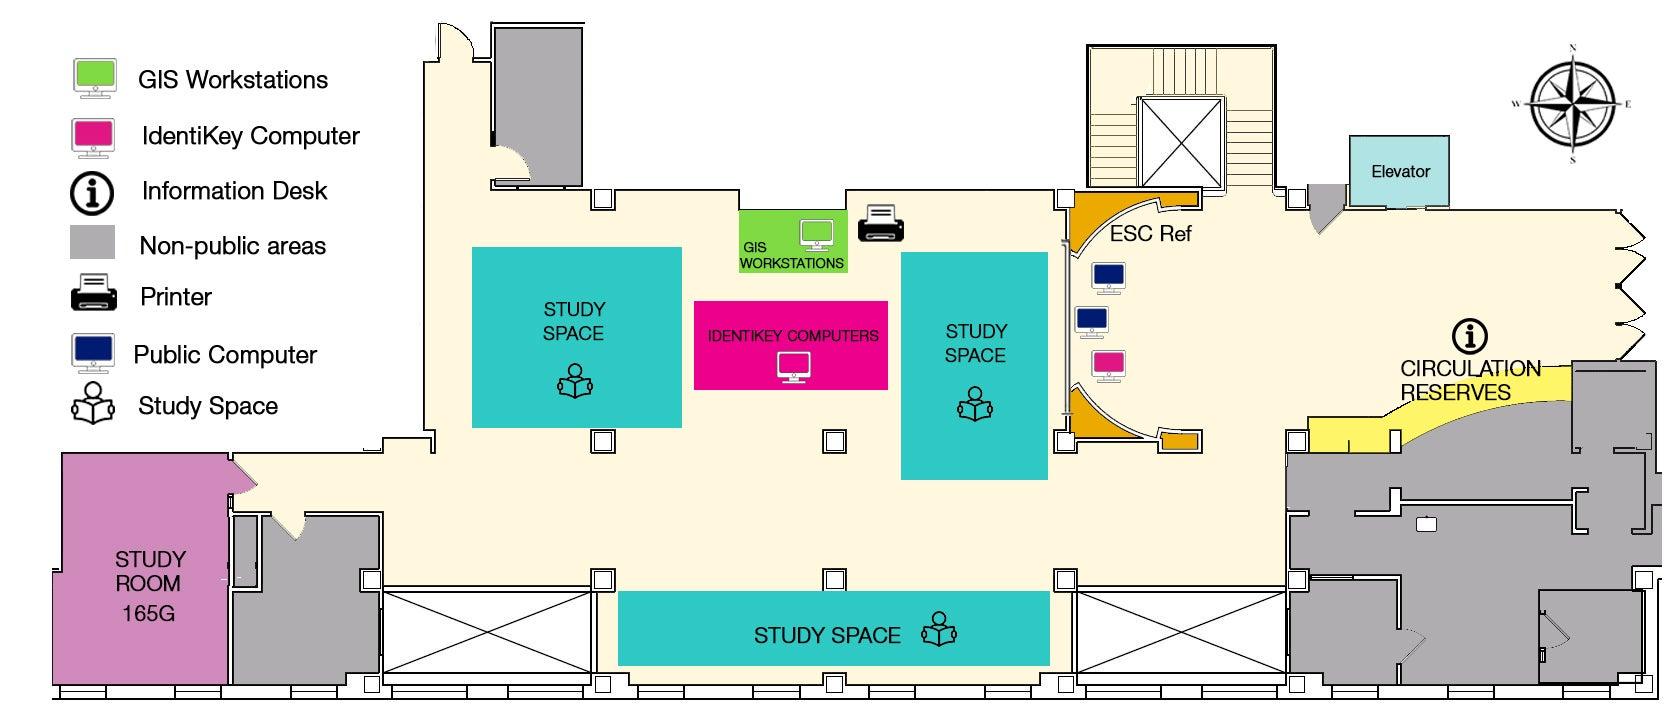 Earth Sciences Map Library Floor Plans University Libraries University Of Colorado Boulder